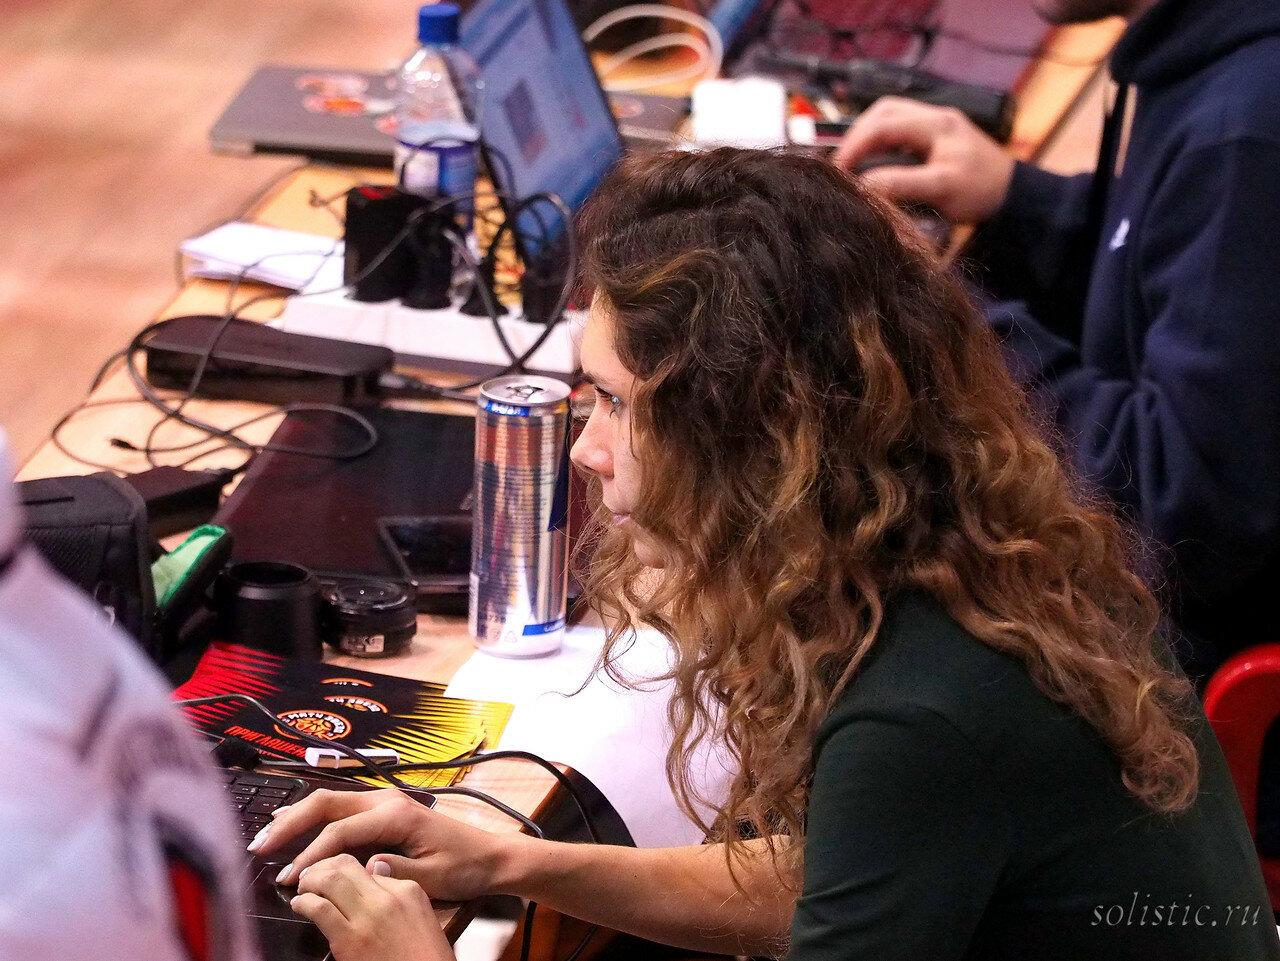 136 Матч звезд АСБ 2018 (ассоциации студенческого баскетбола)